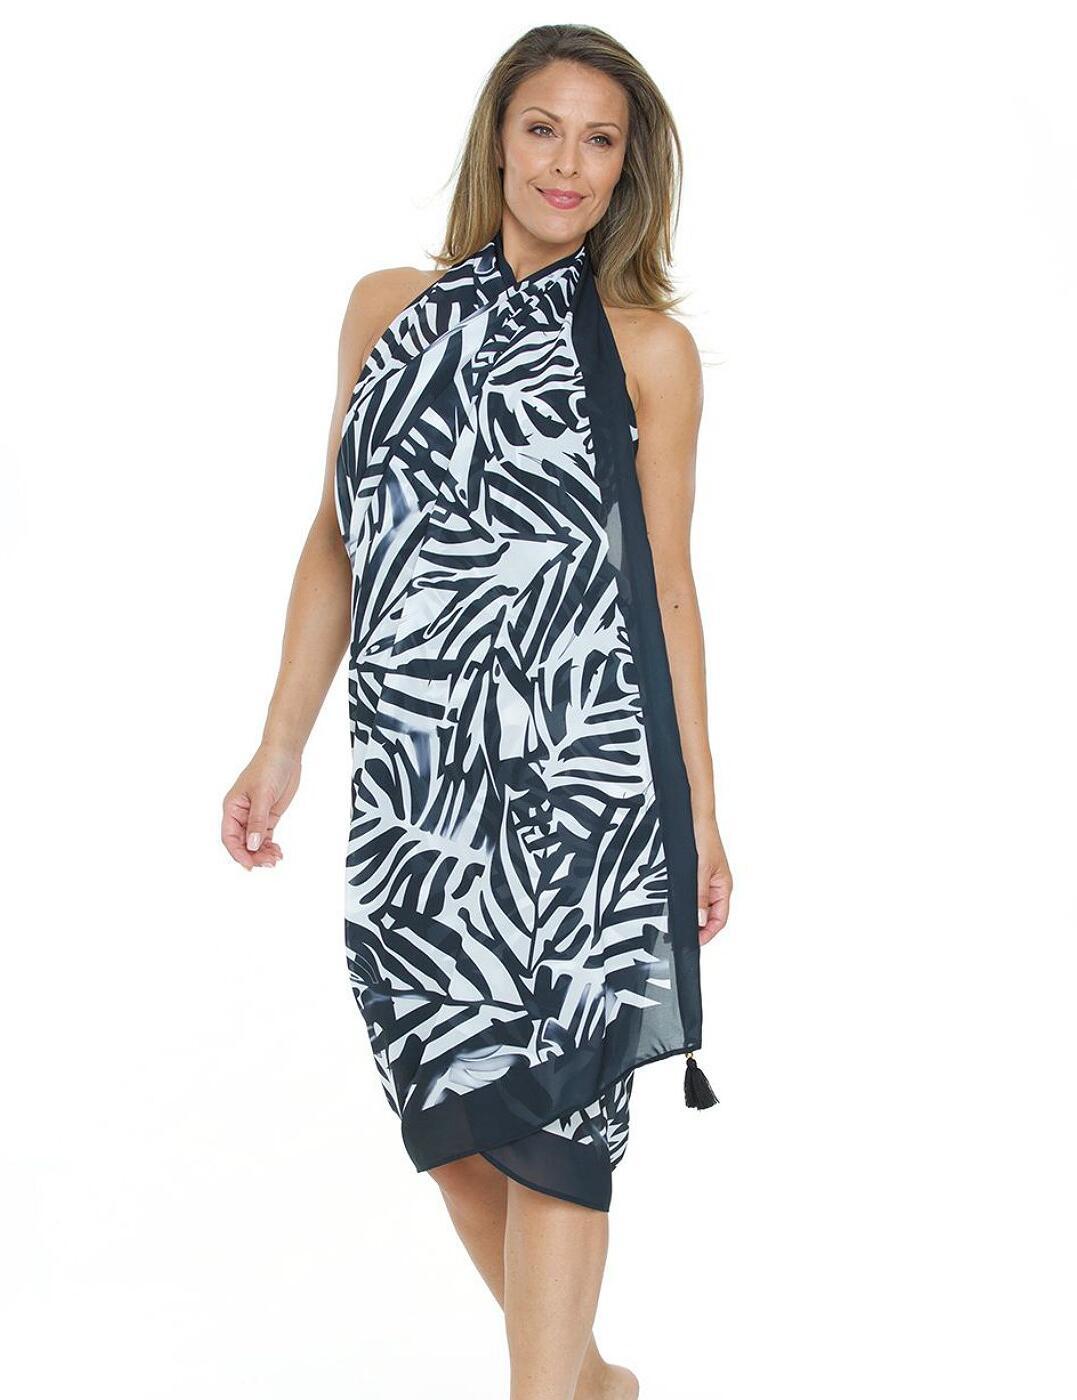 Seaspray Palm Noir Black /& White Print Tassel Pareo